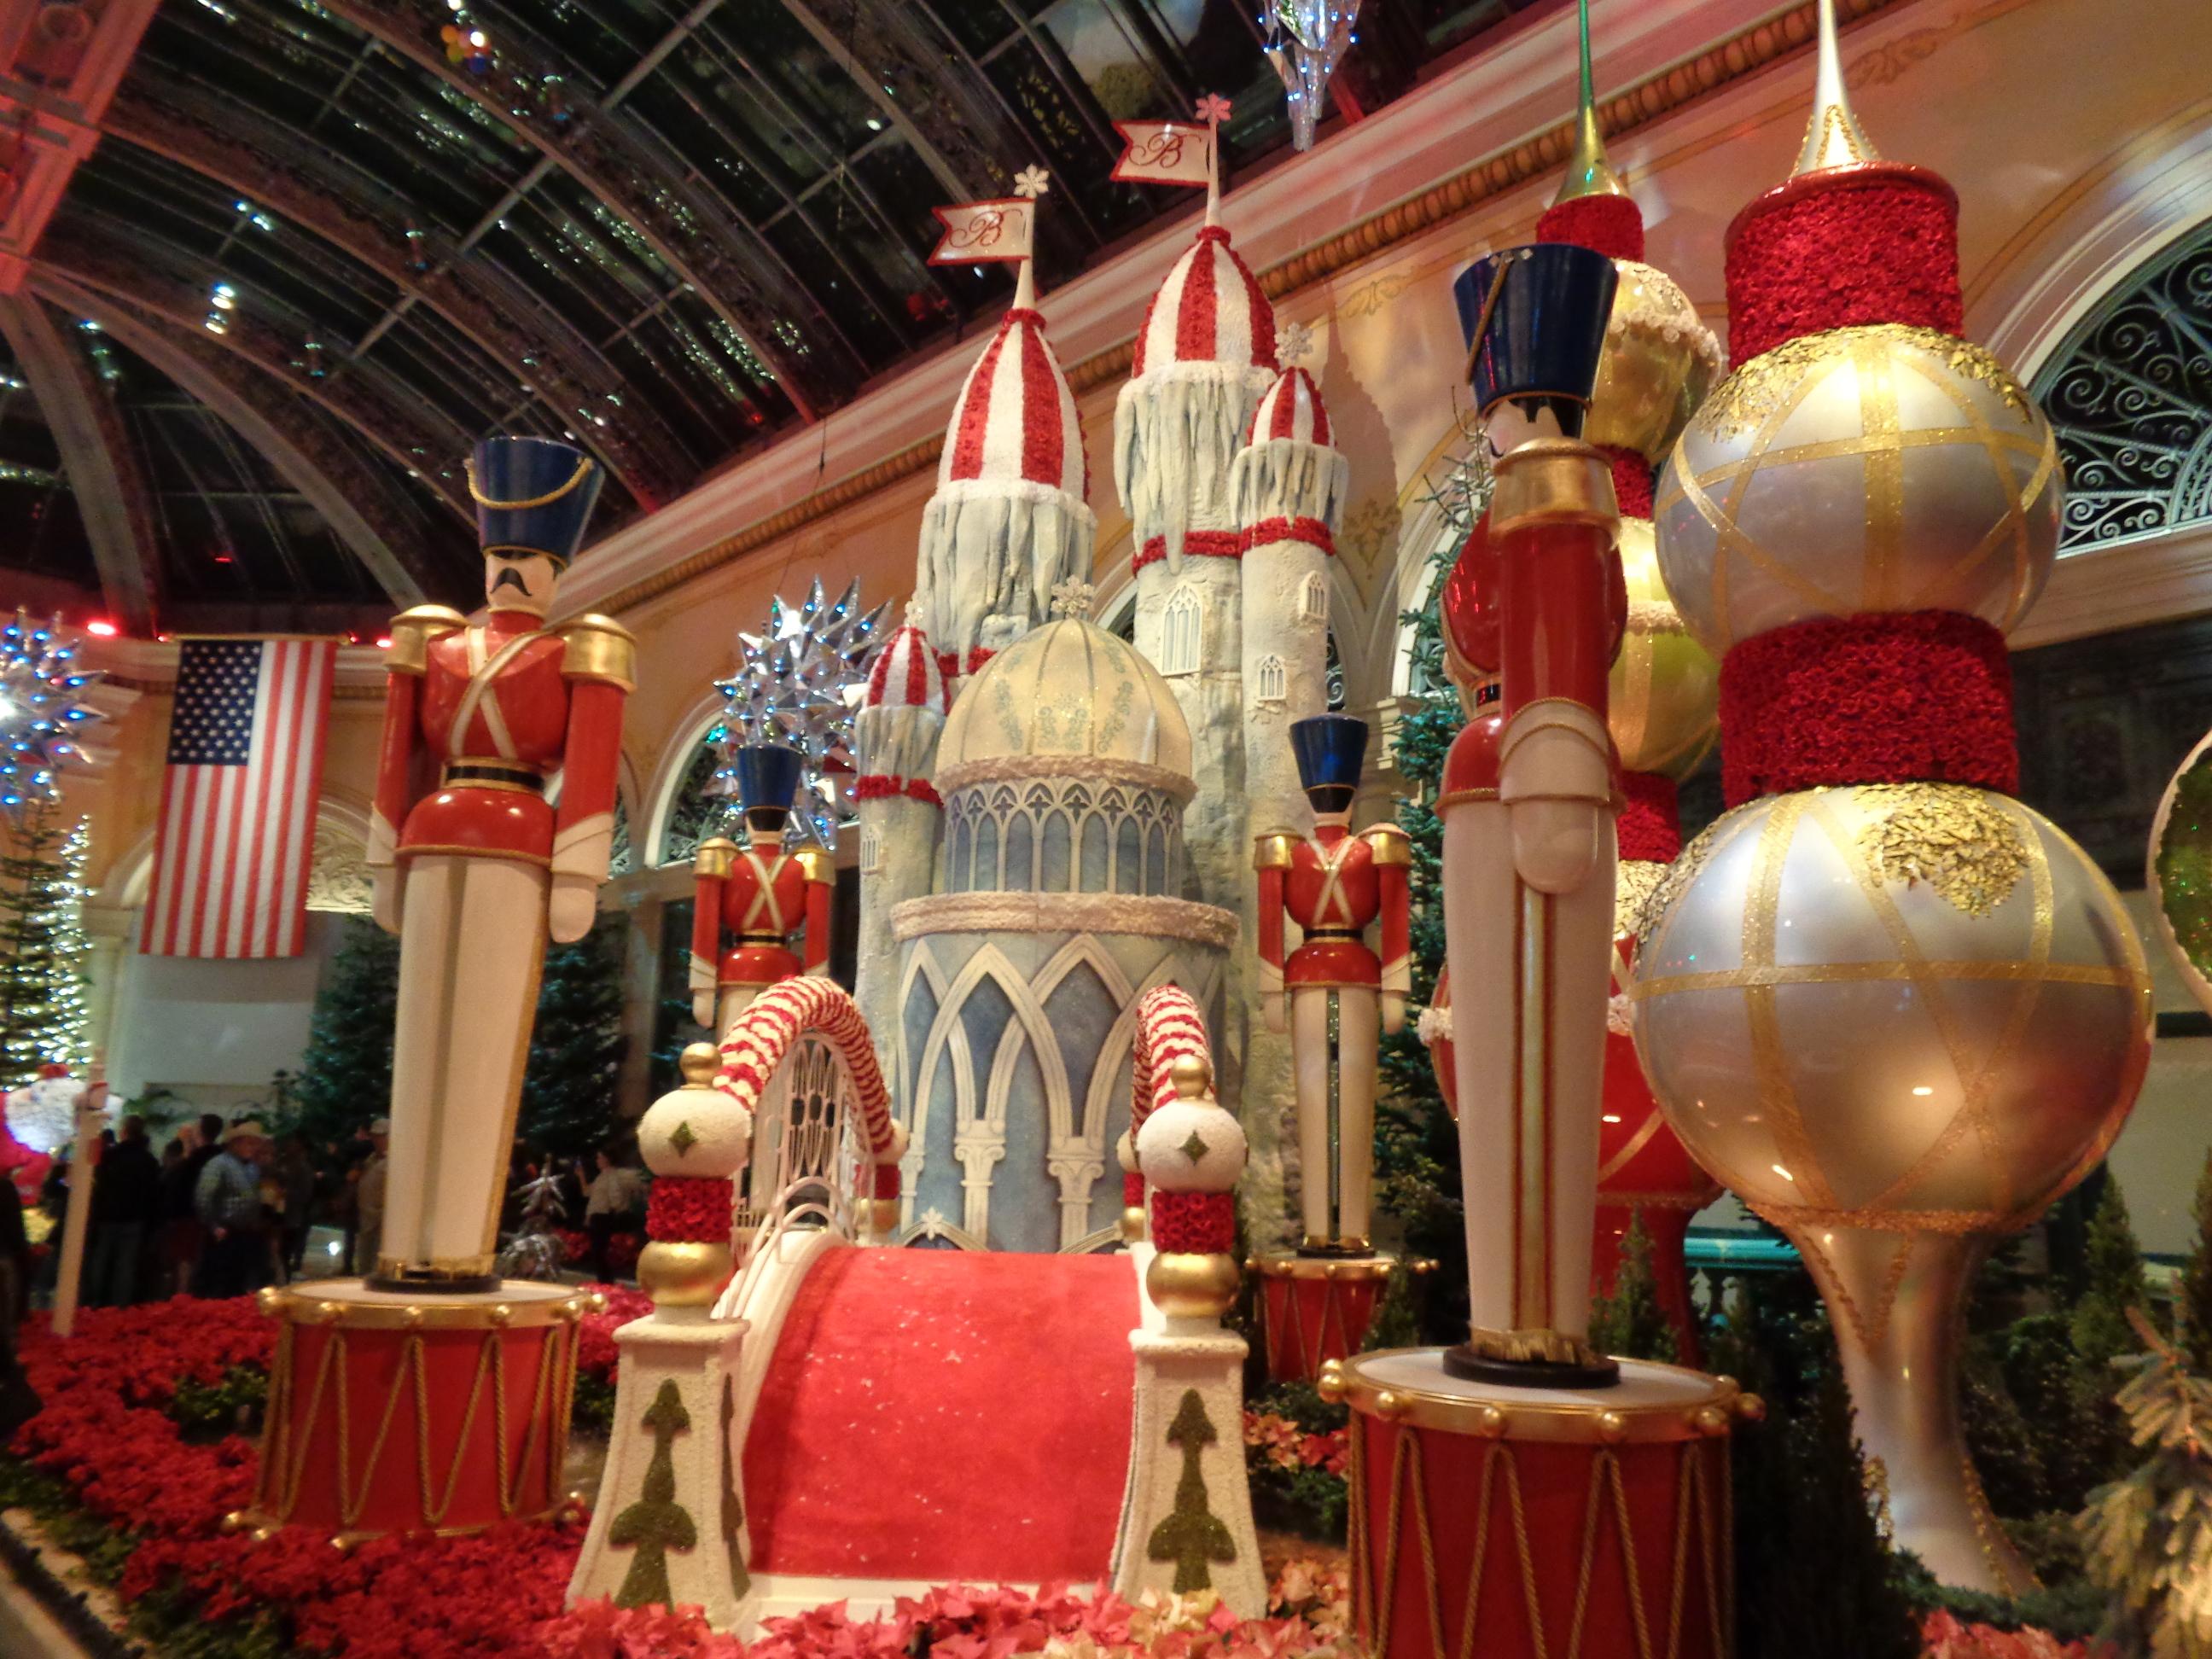 Christmas In Vegas.Las Vegas Holiday Christmas Displays 2018 Vegaschanges